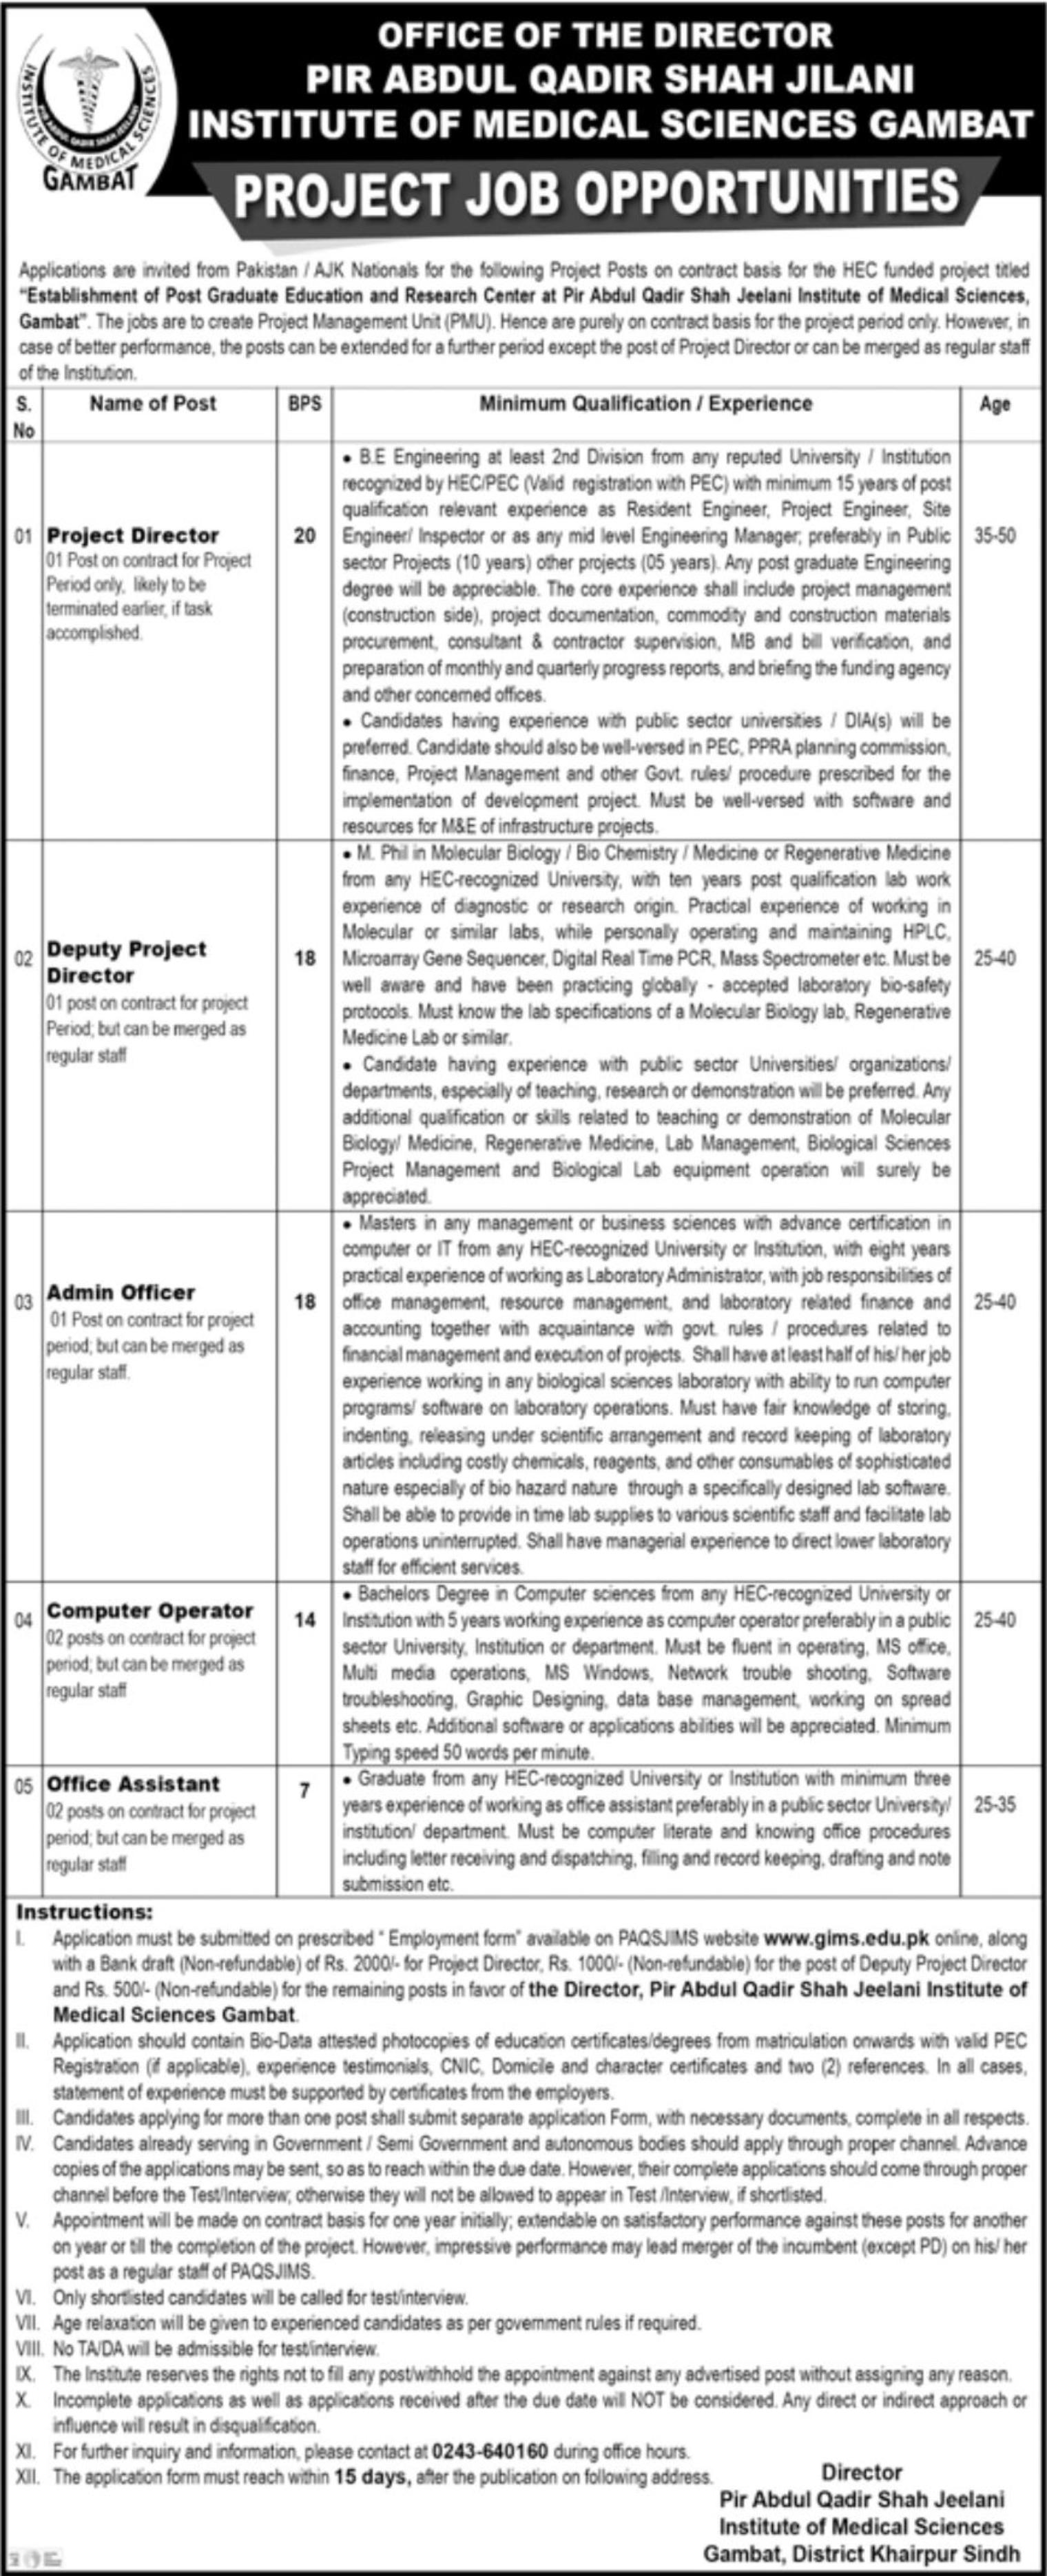 PIR Abdul Qadir Shah Jilani Institute of Medical Sciences Gambat Vacancies 2021 3